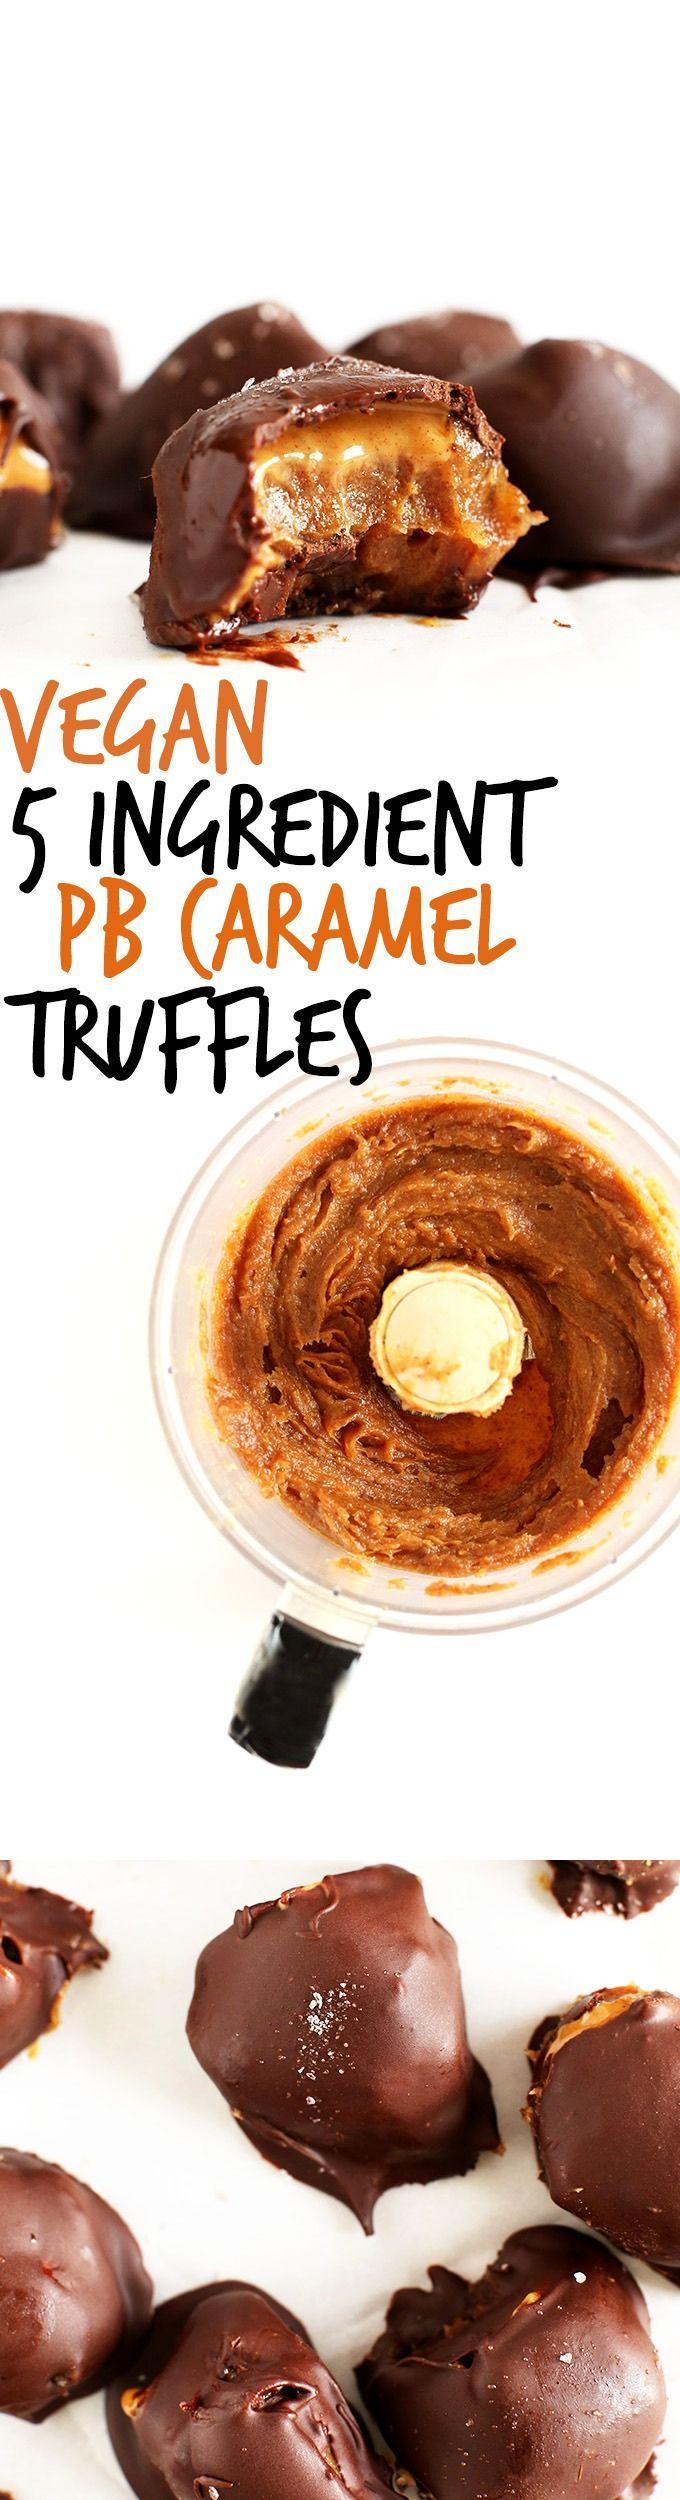 AMAZING 5 ingredient Vegan Truffles with salted DATE CARAMEL, Peanut Butter and Chocolate! #vegan #glutenfree